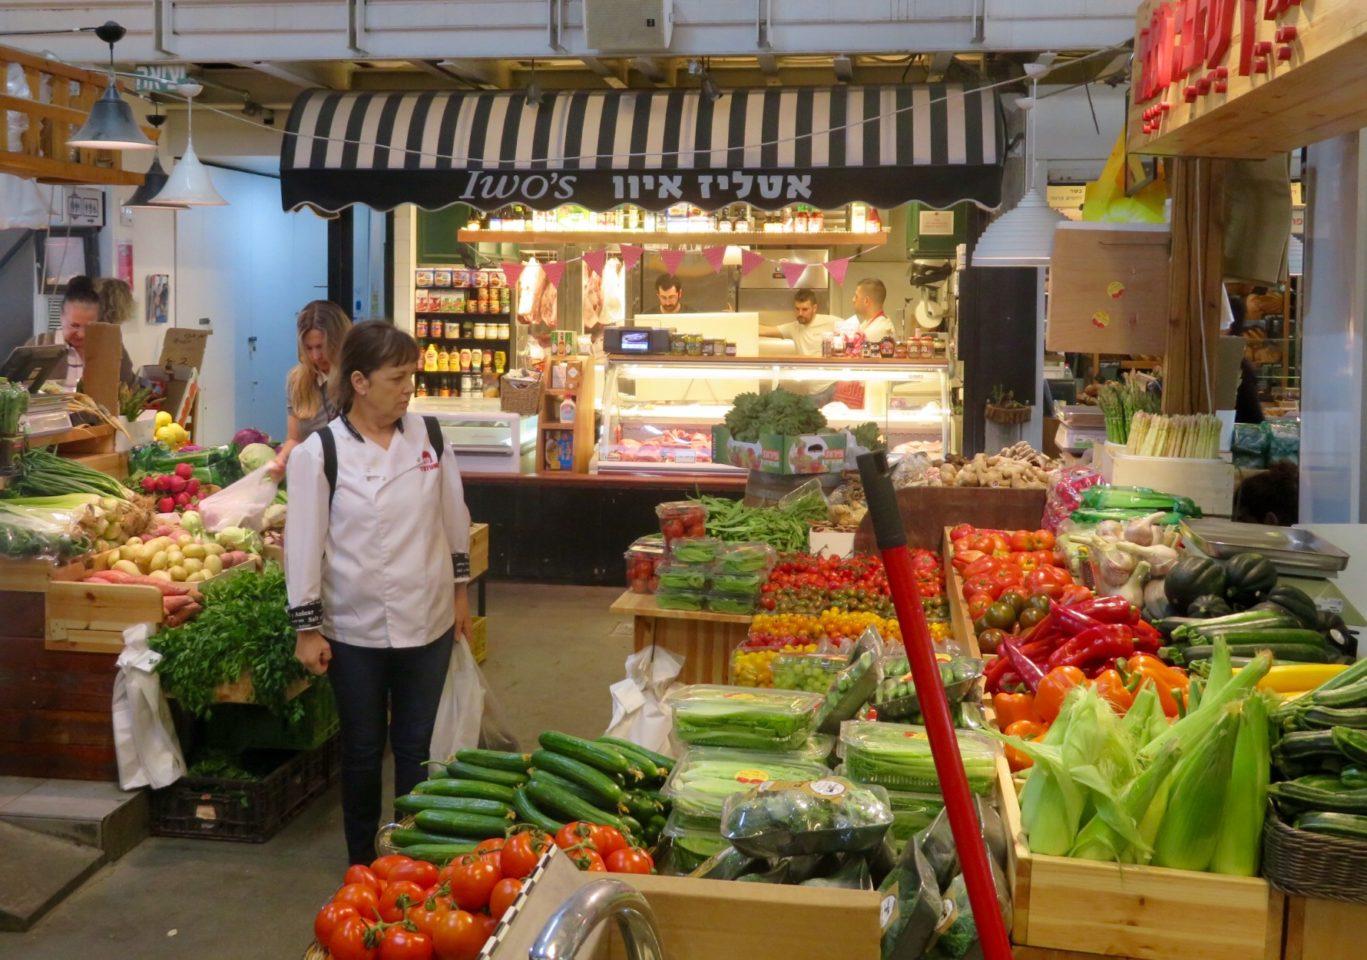 Tel Aviv Beach : The indoor / outdoor food market at the Old Port of Tel Aviv